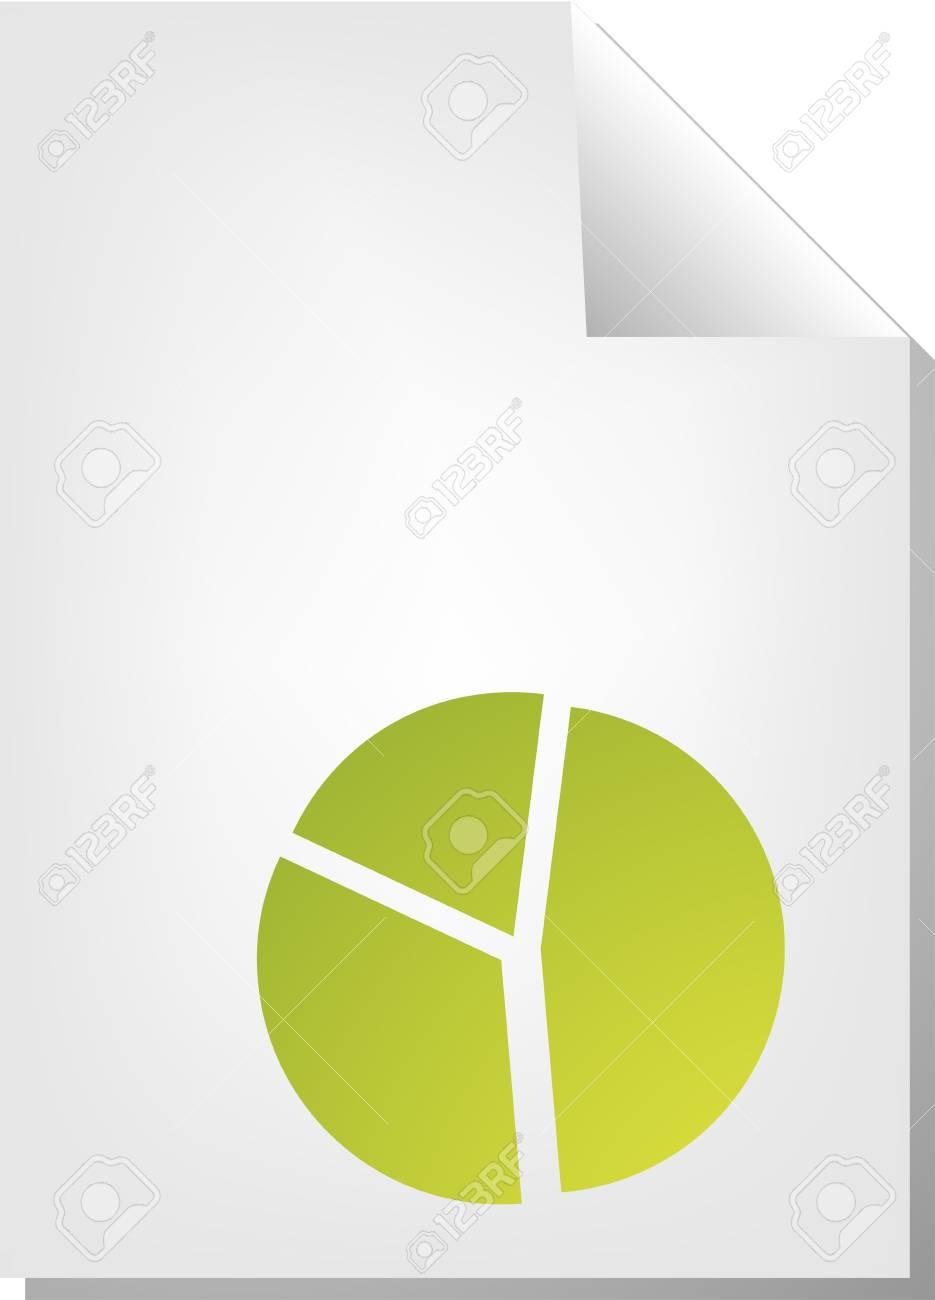 hight resolution of illustration pie chart document file type illustration clipart